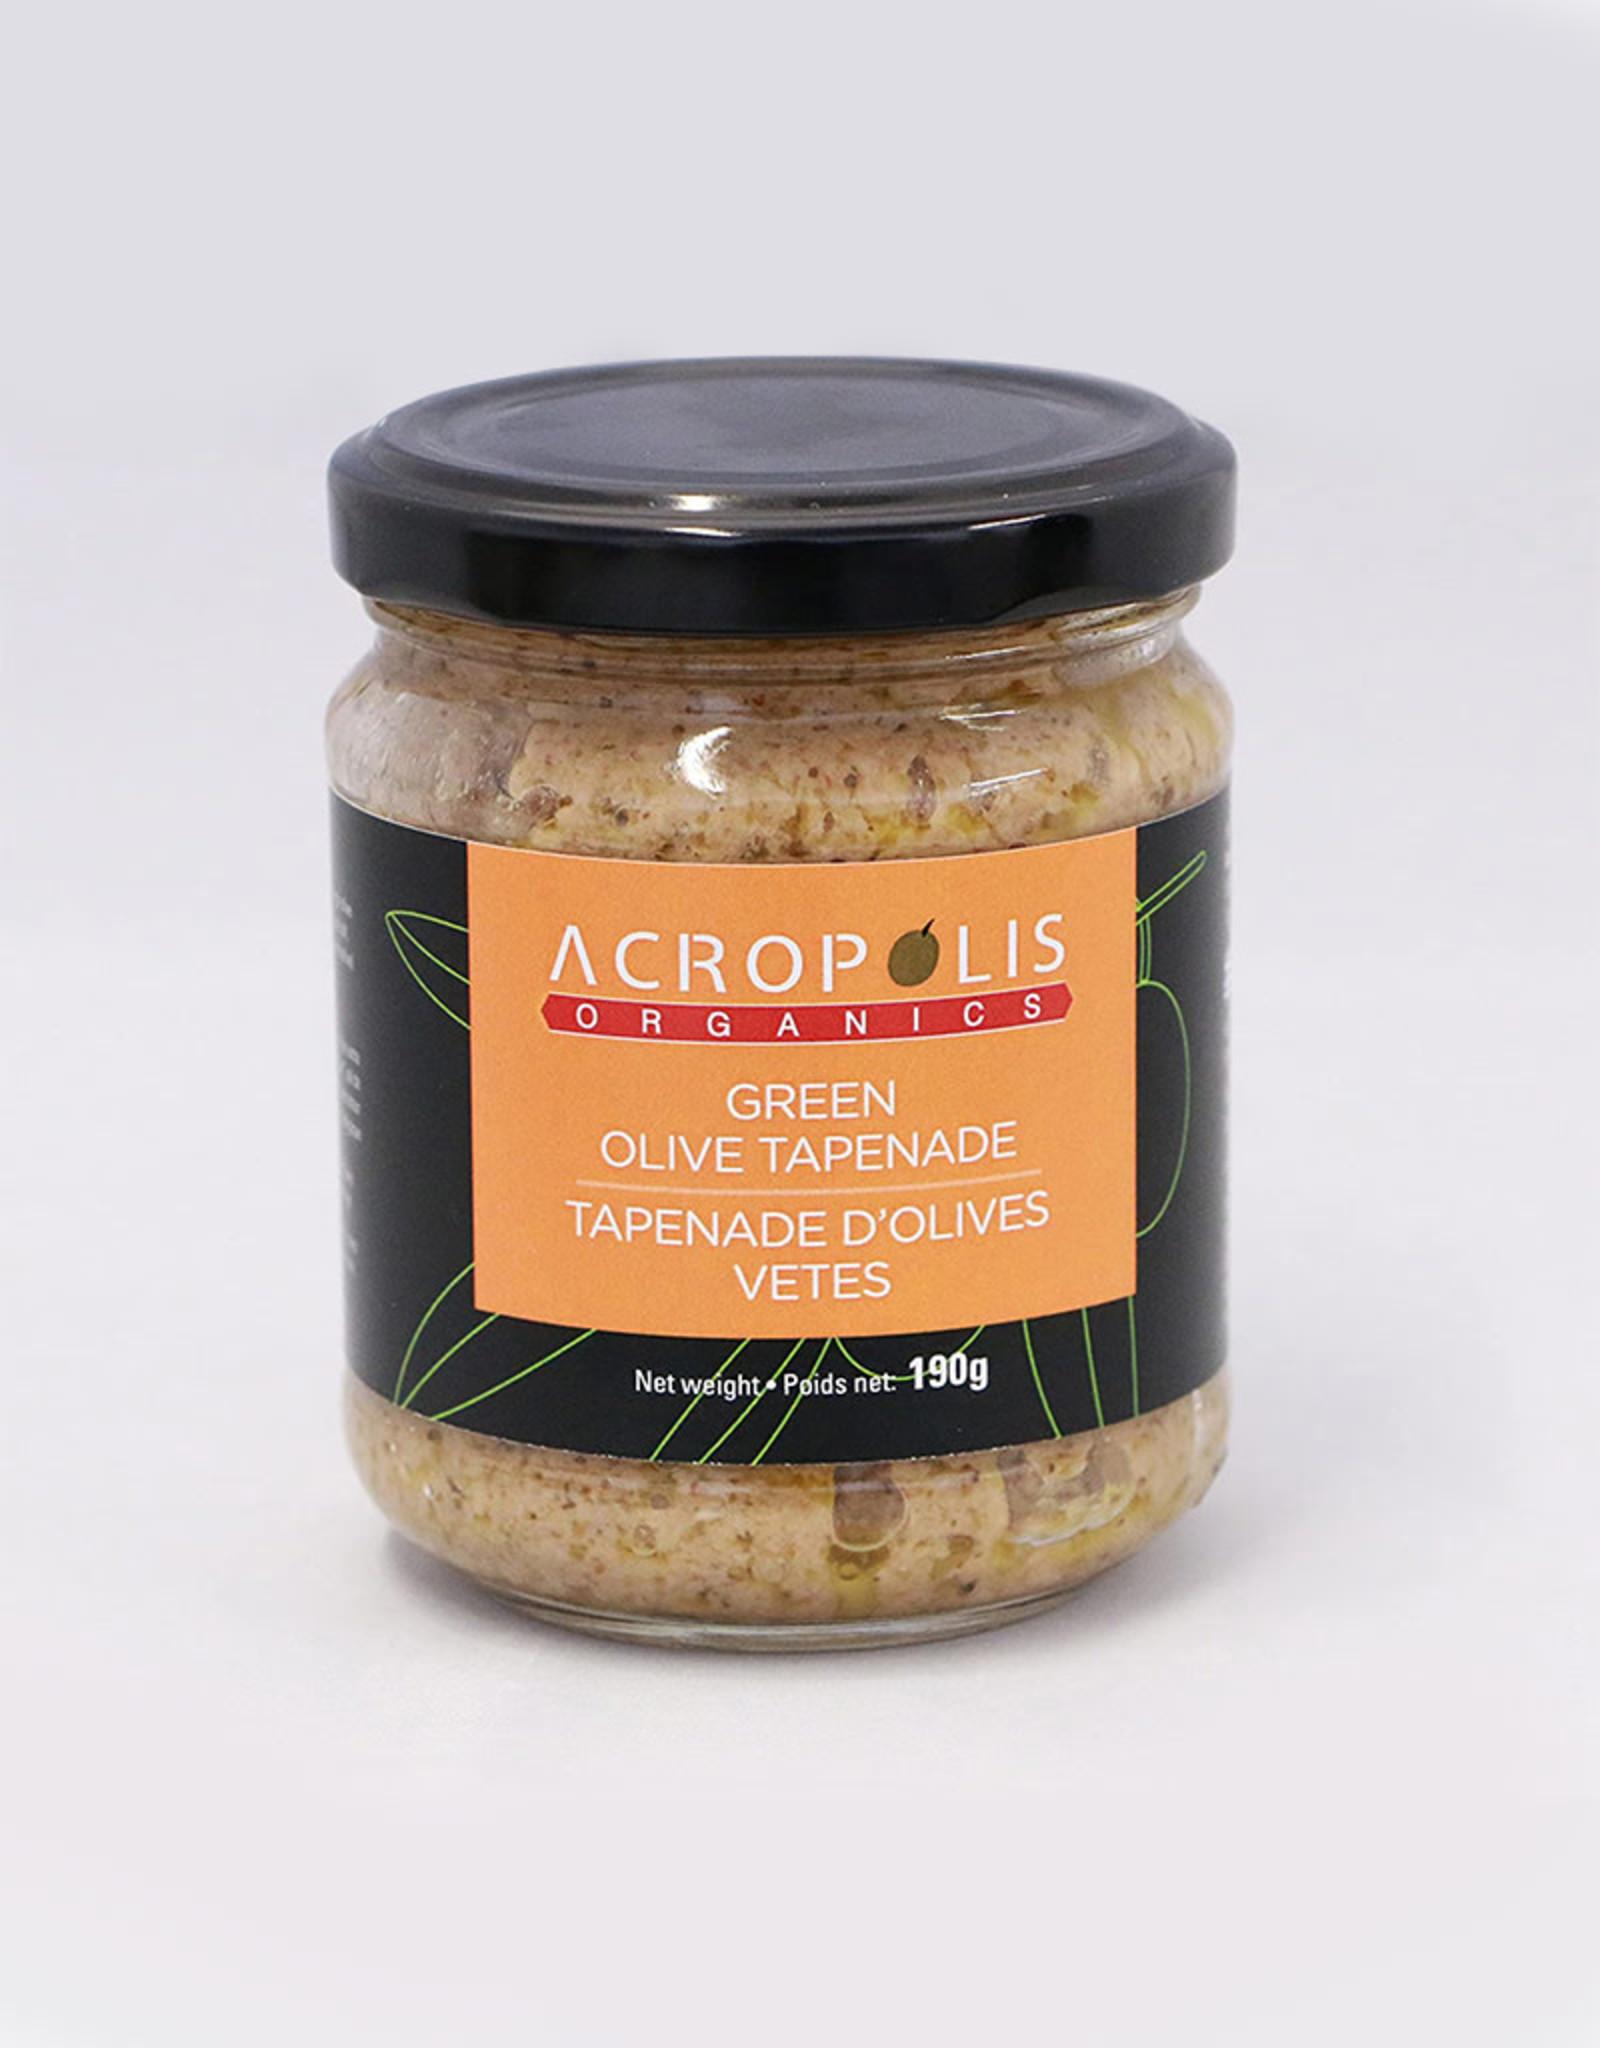 Acropolis Acropolis - Green Olive Tapenade (190g)